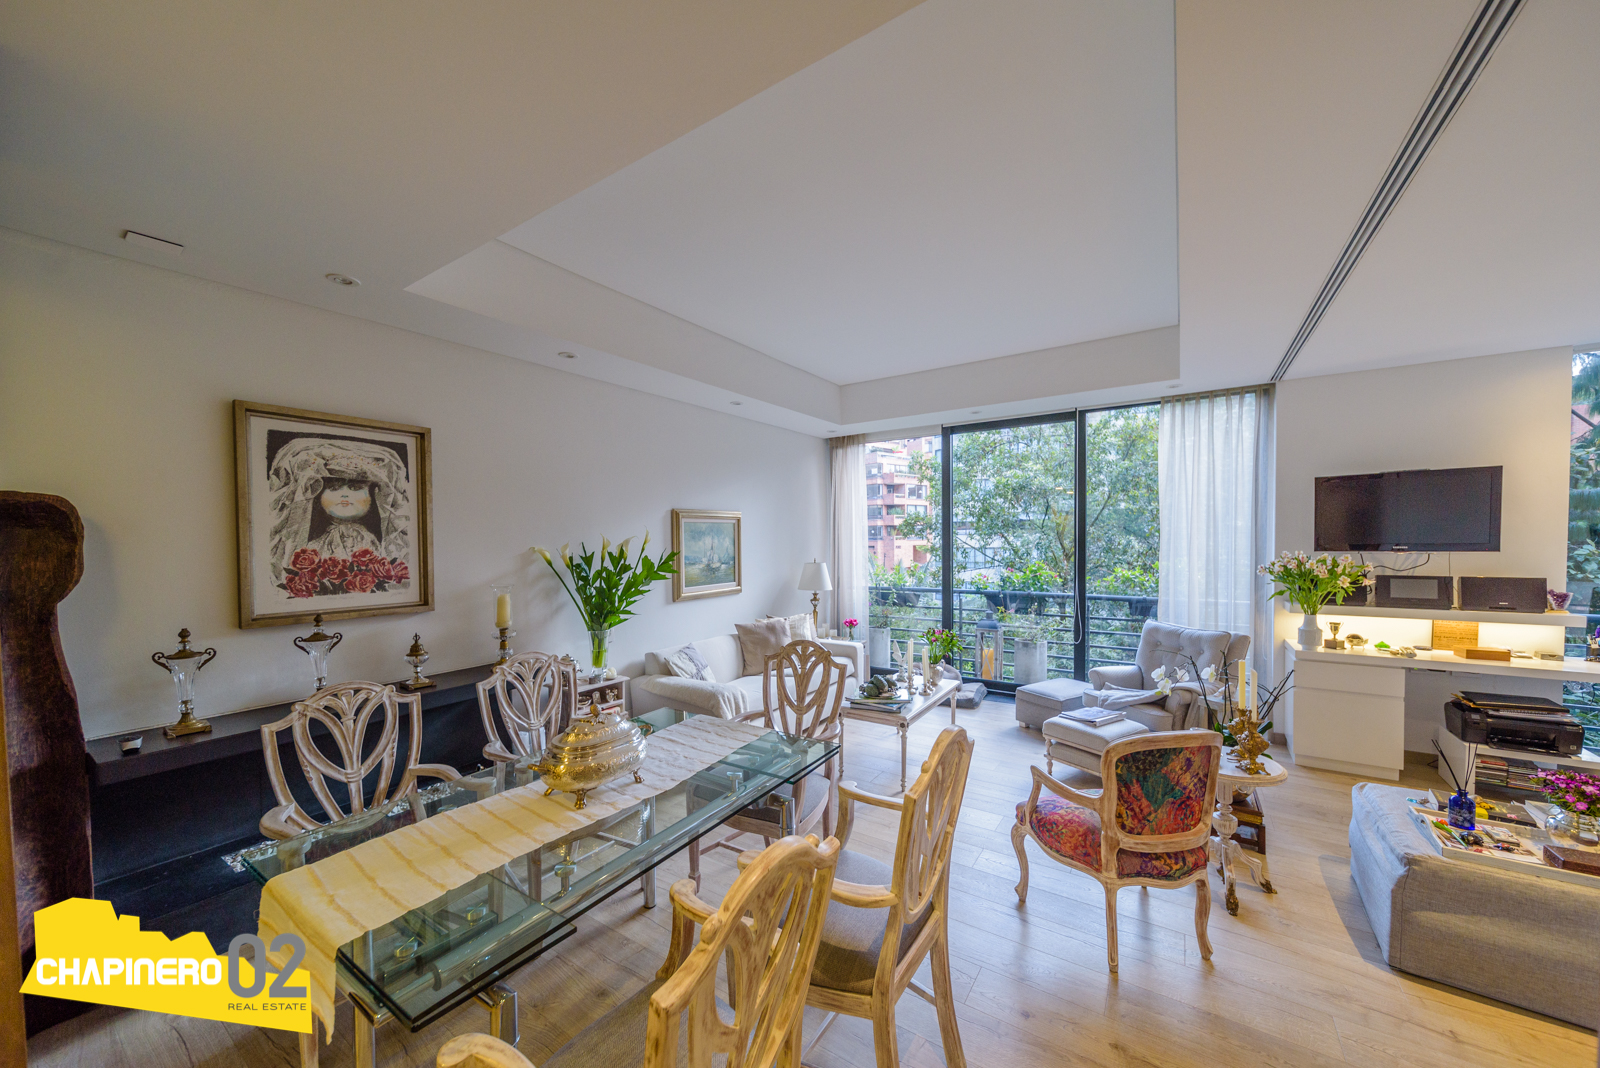 Apto Venta :: 80 m² :: Rosales :: $770 M